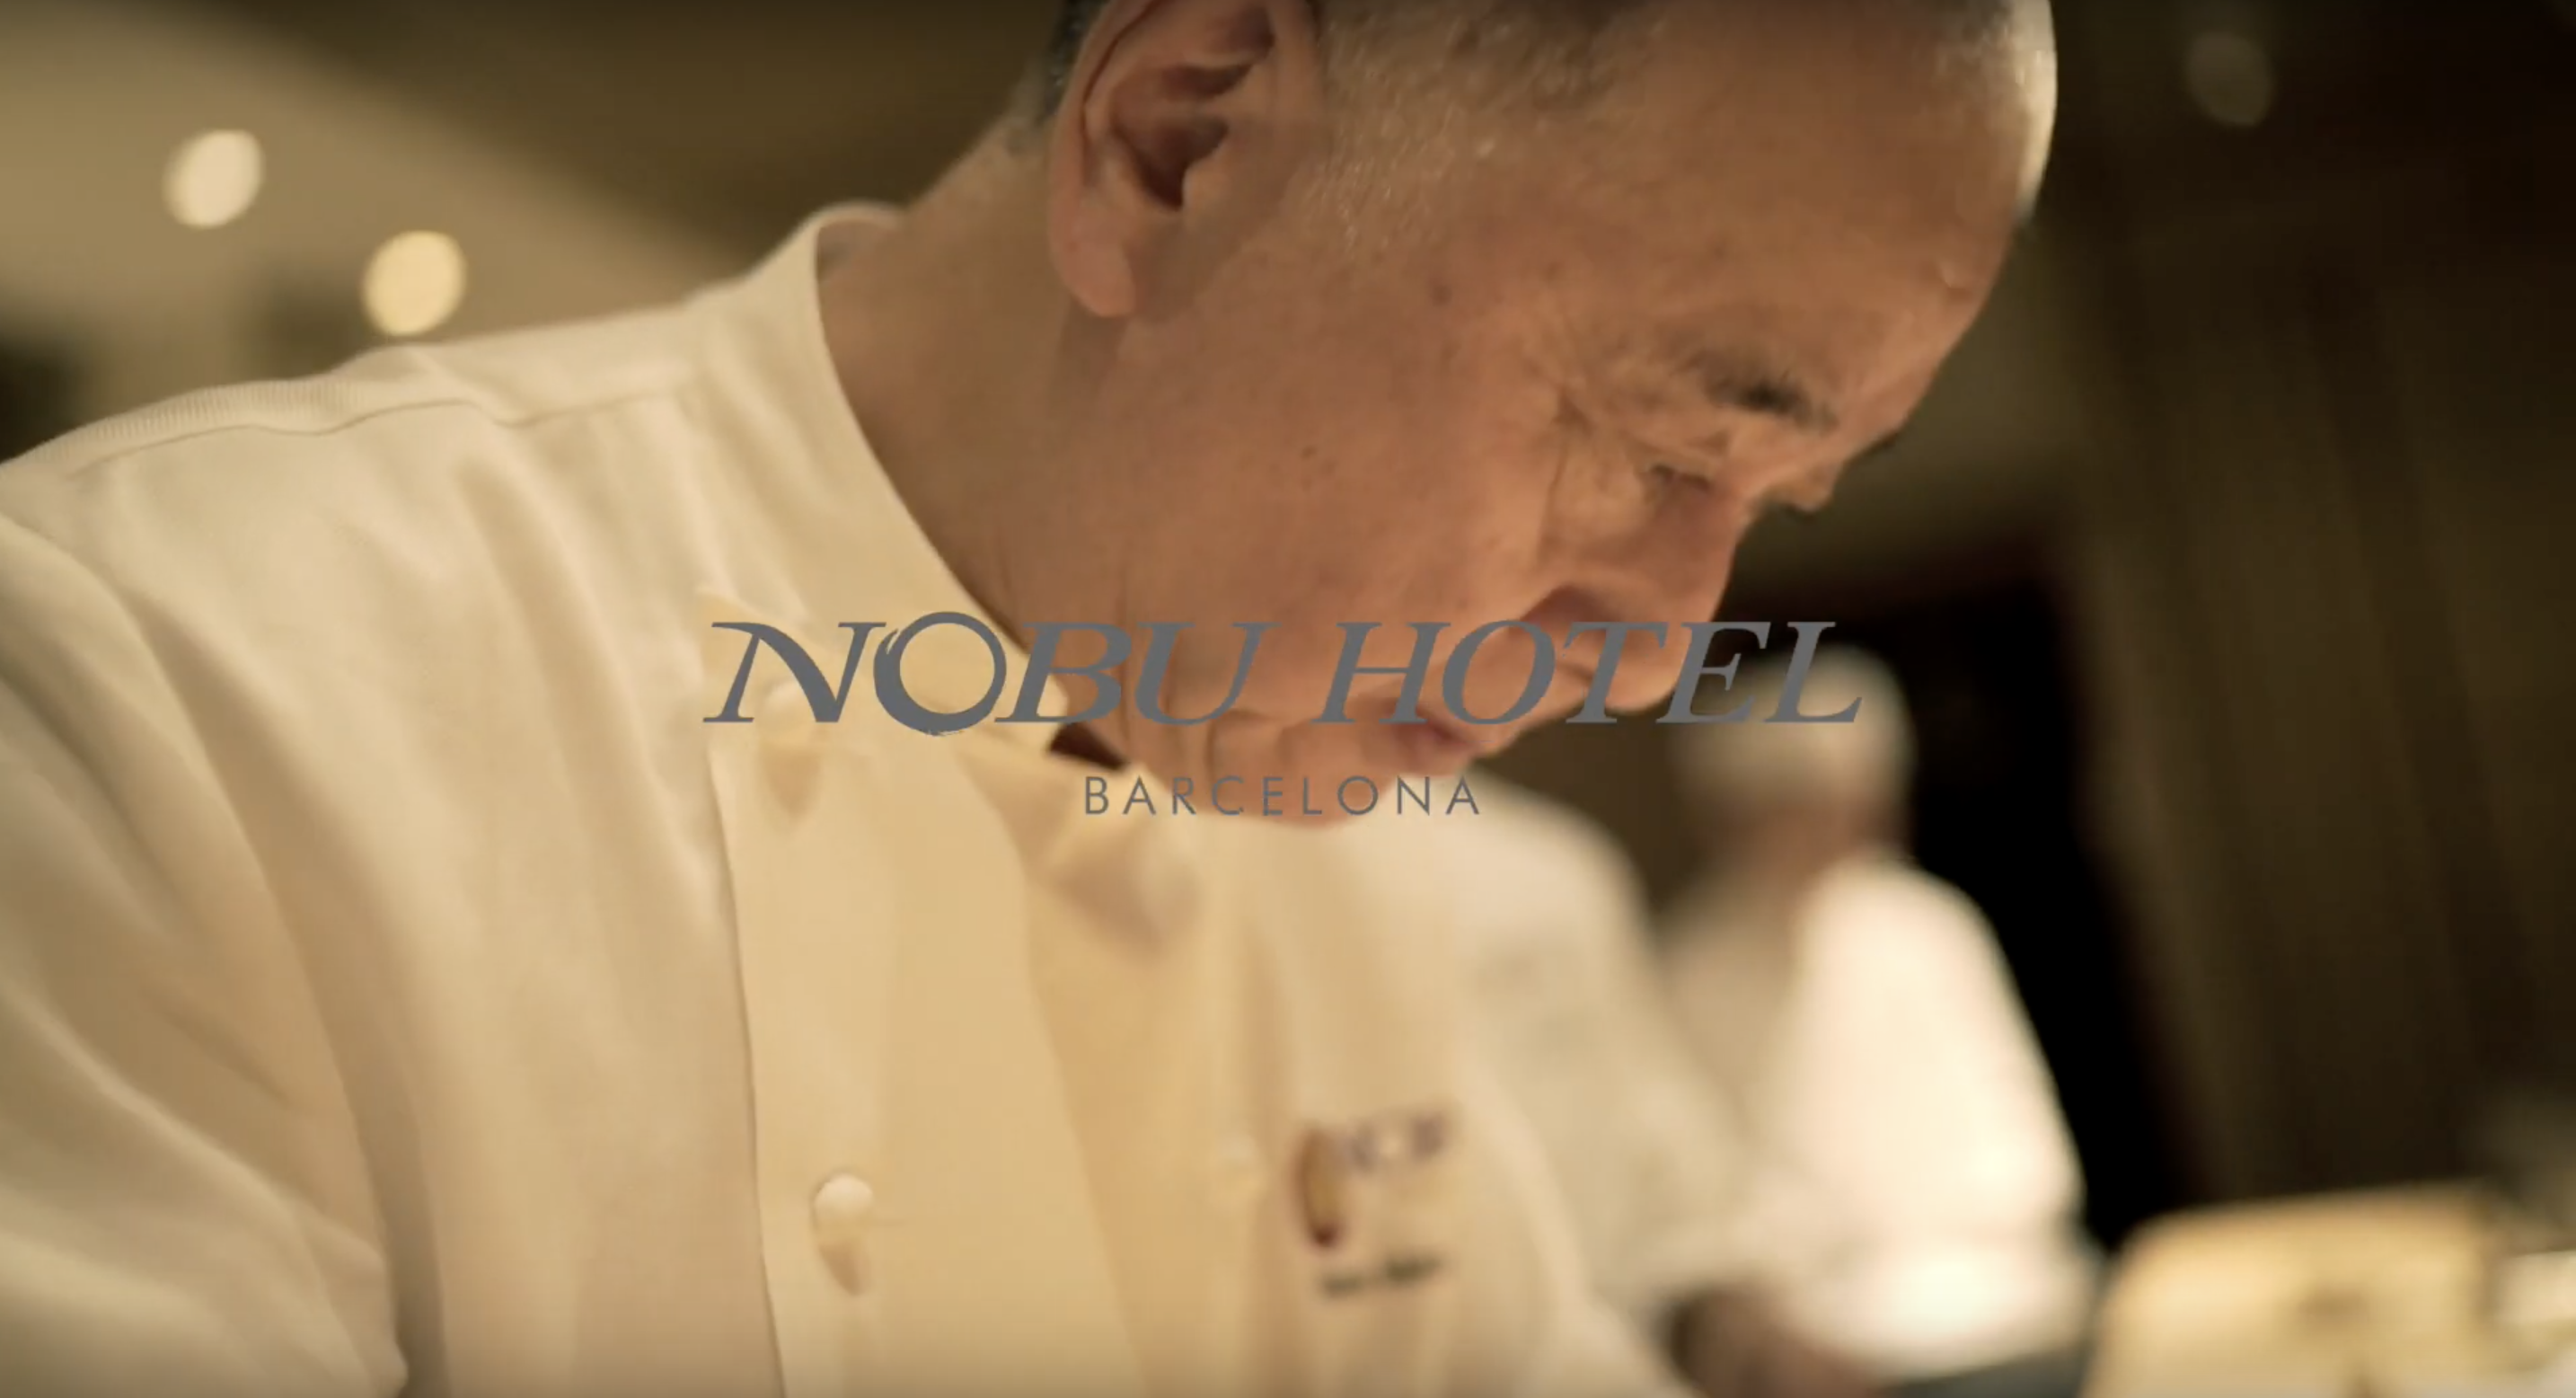 Nobu Hotel Barcelona Destination Video